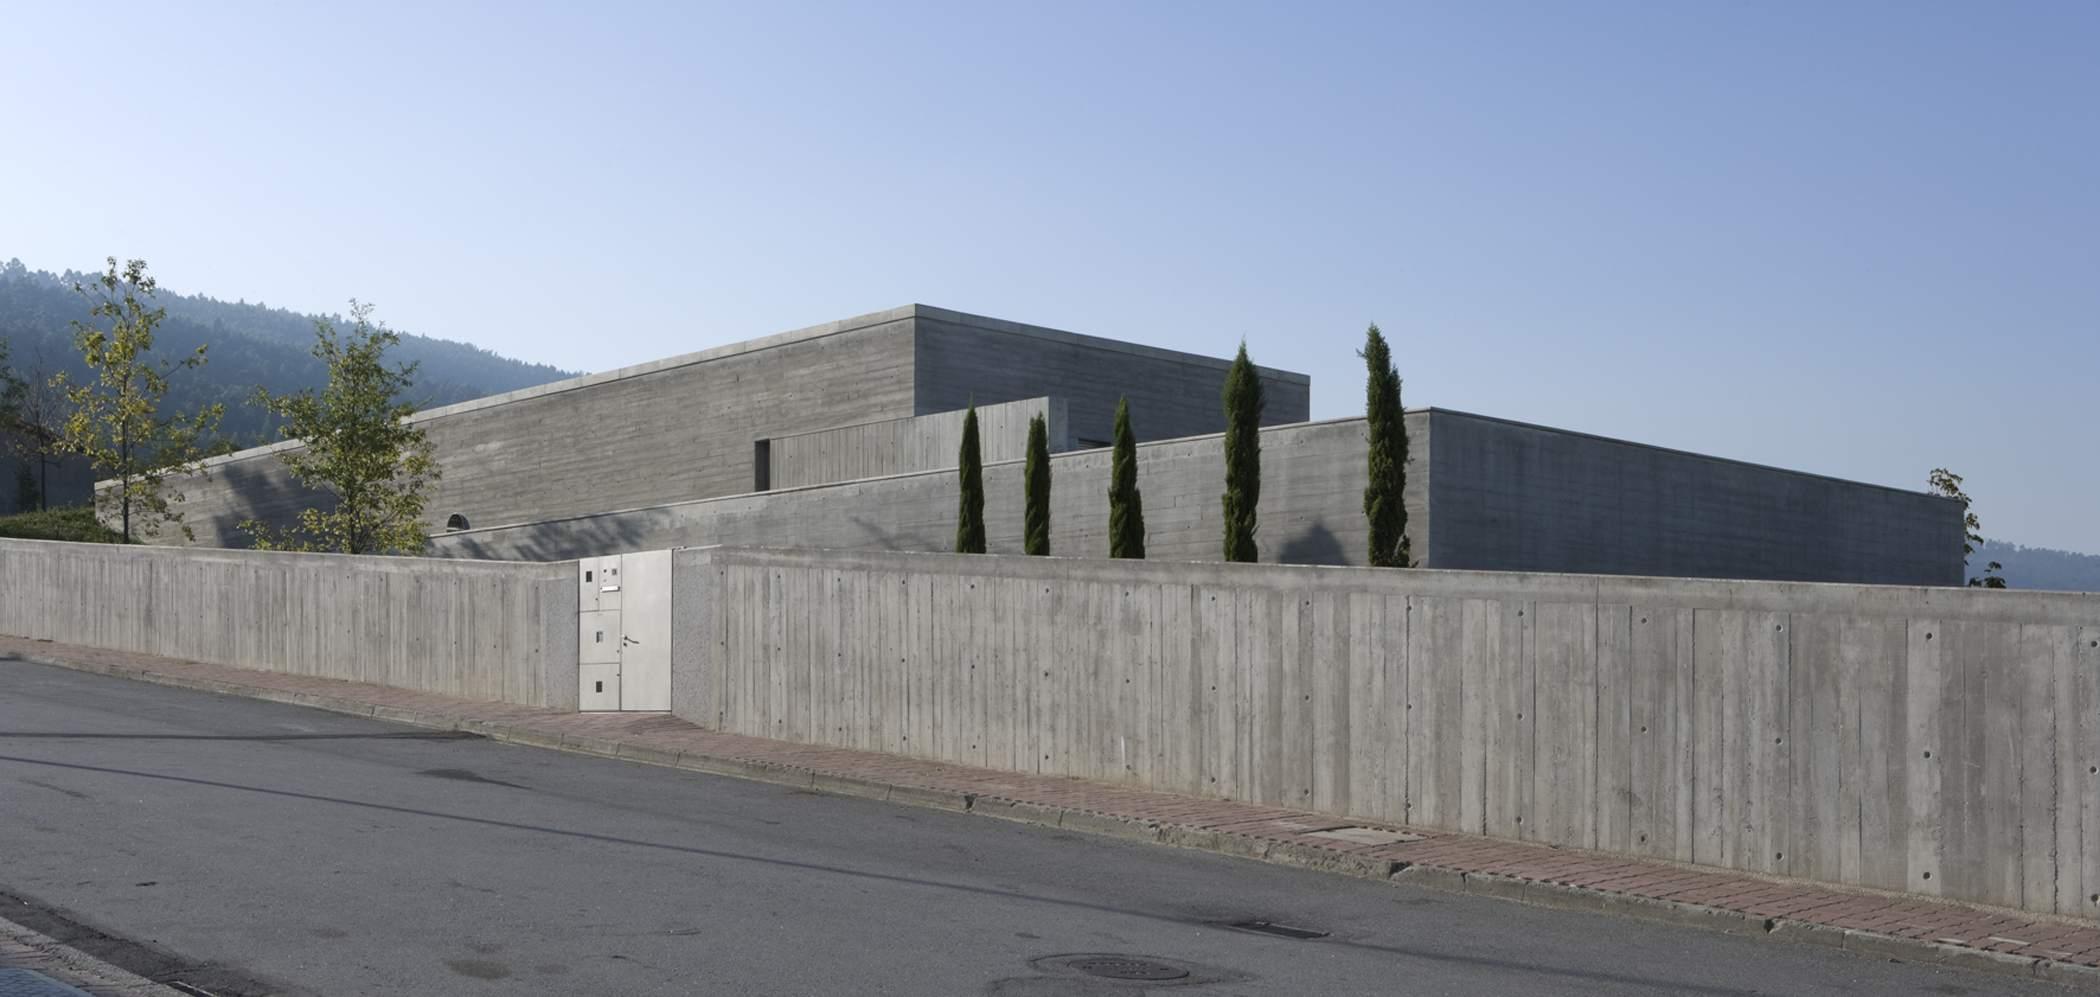 Bom Jesus House in Braga, Protugal by Eduardo Souto de Moura